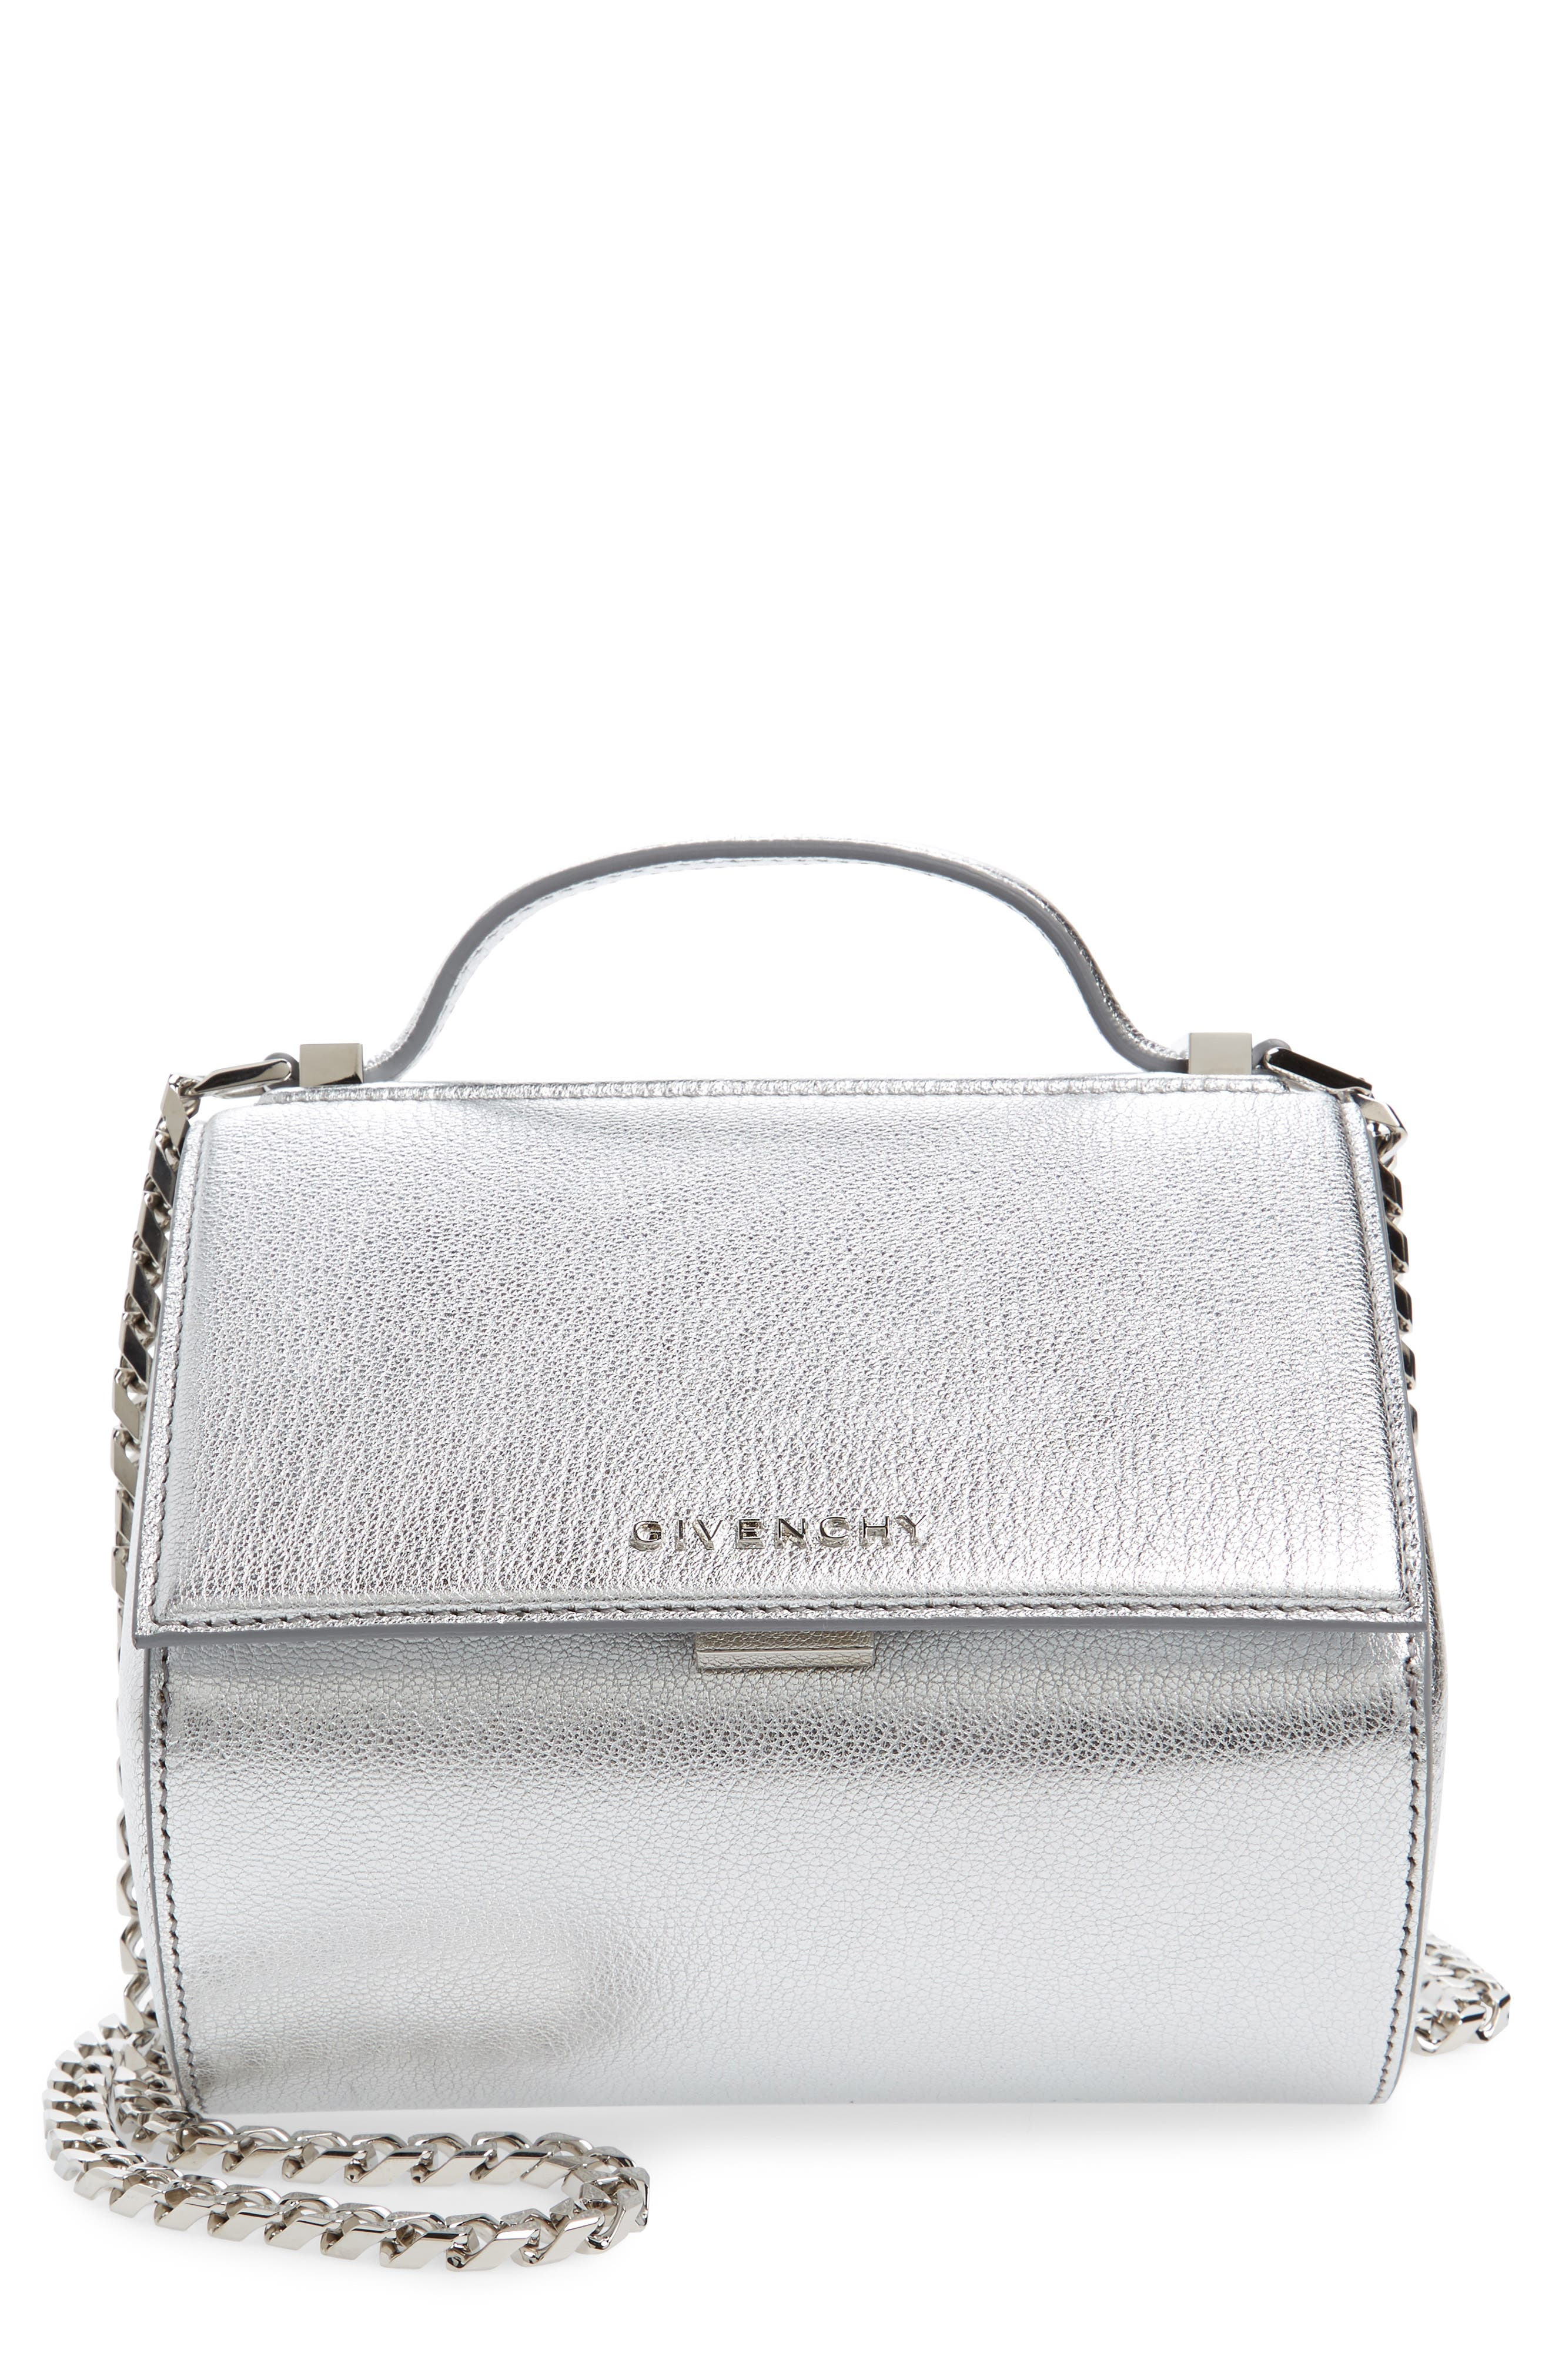 Alternate Image 1 Selected - Givenchy Pandora Metallic Leather Satchel